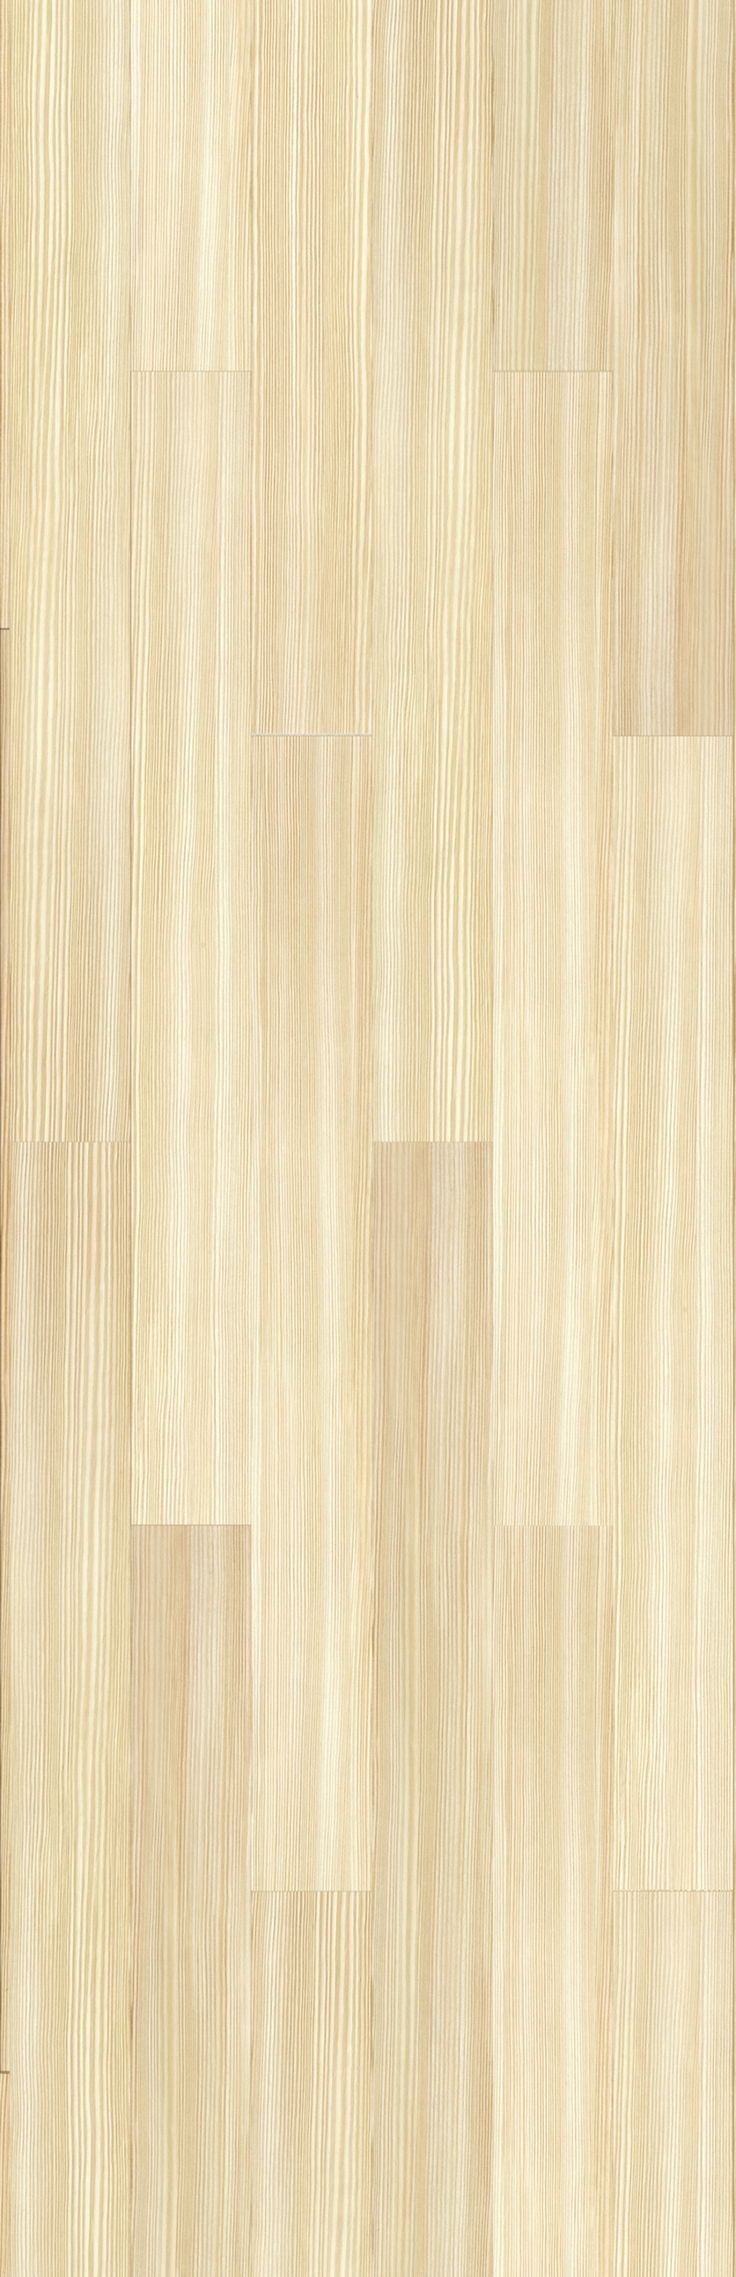 Flooring_에코노_(우드/100각) DEW2566-A1